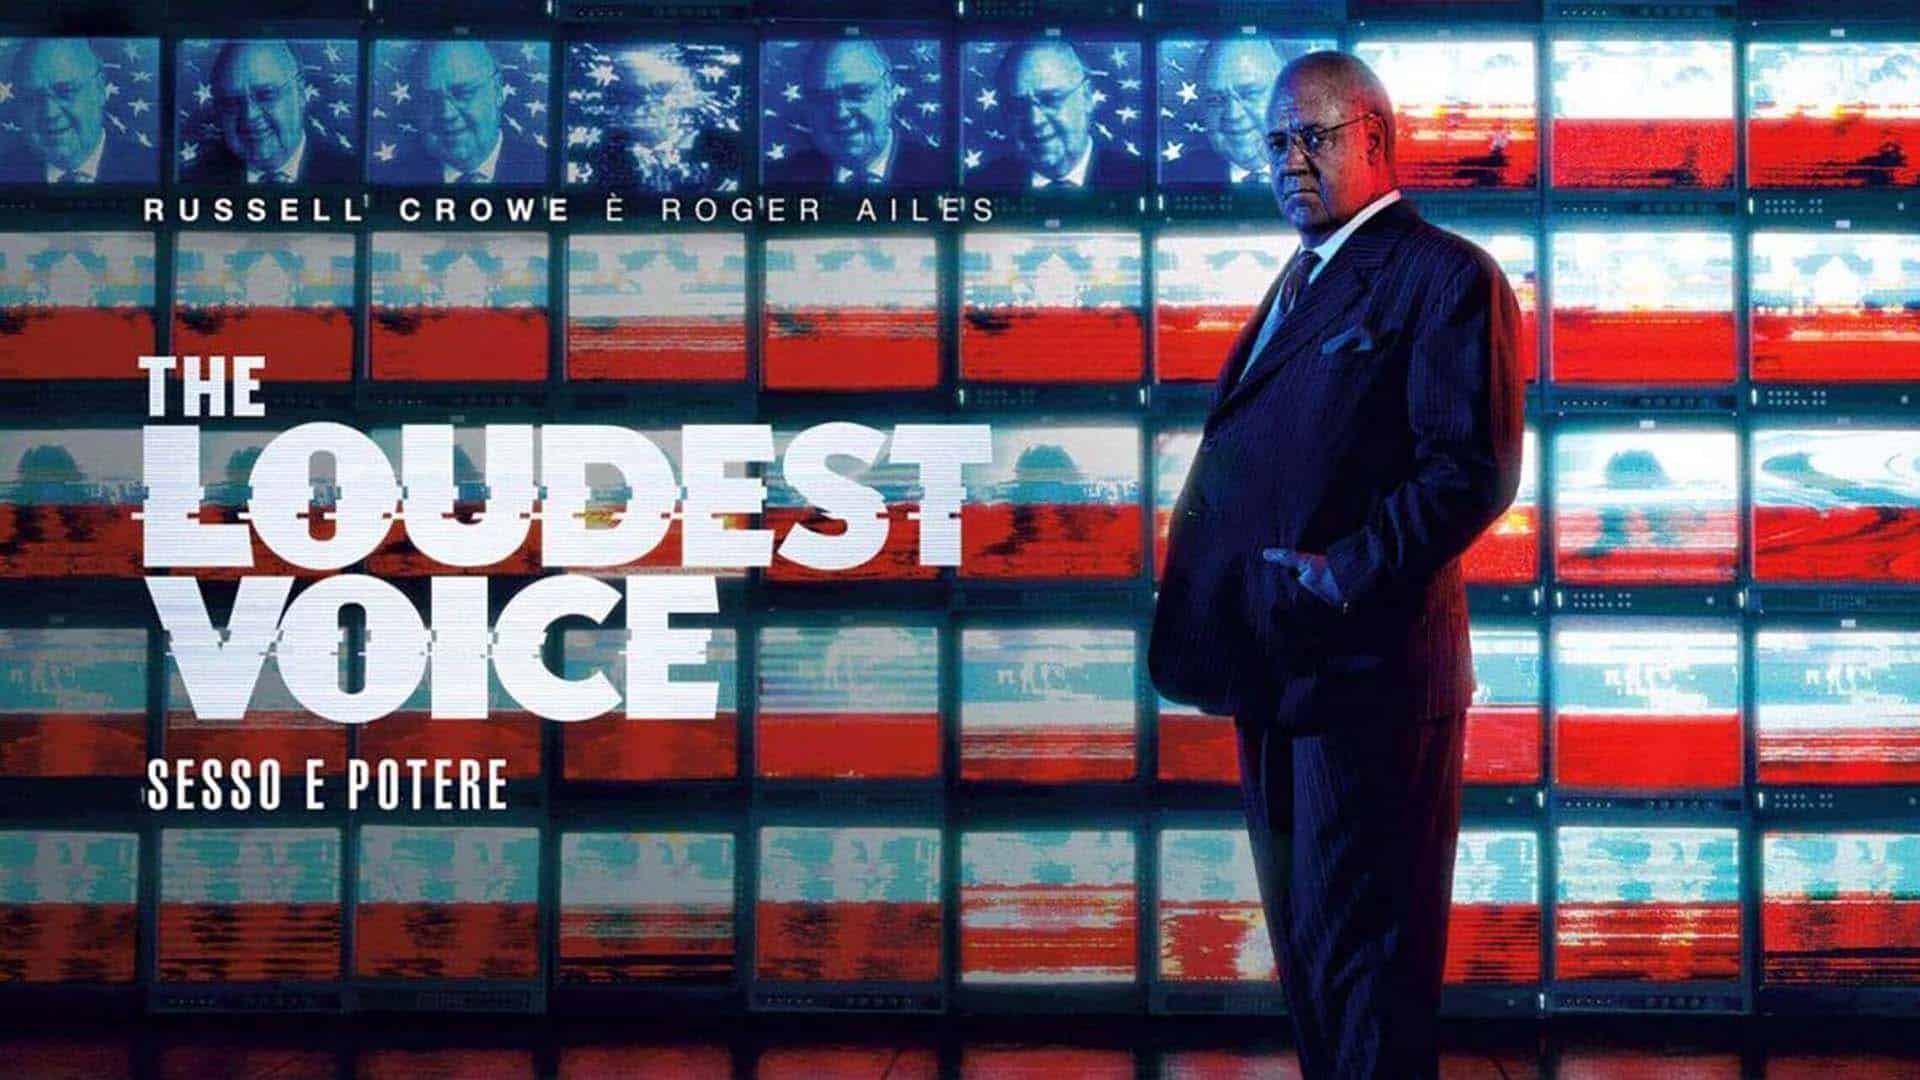 The Loudest Voice – Sesso e Potere